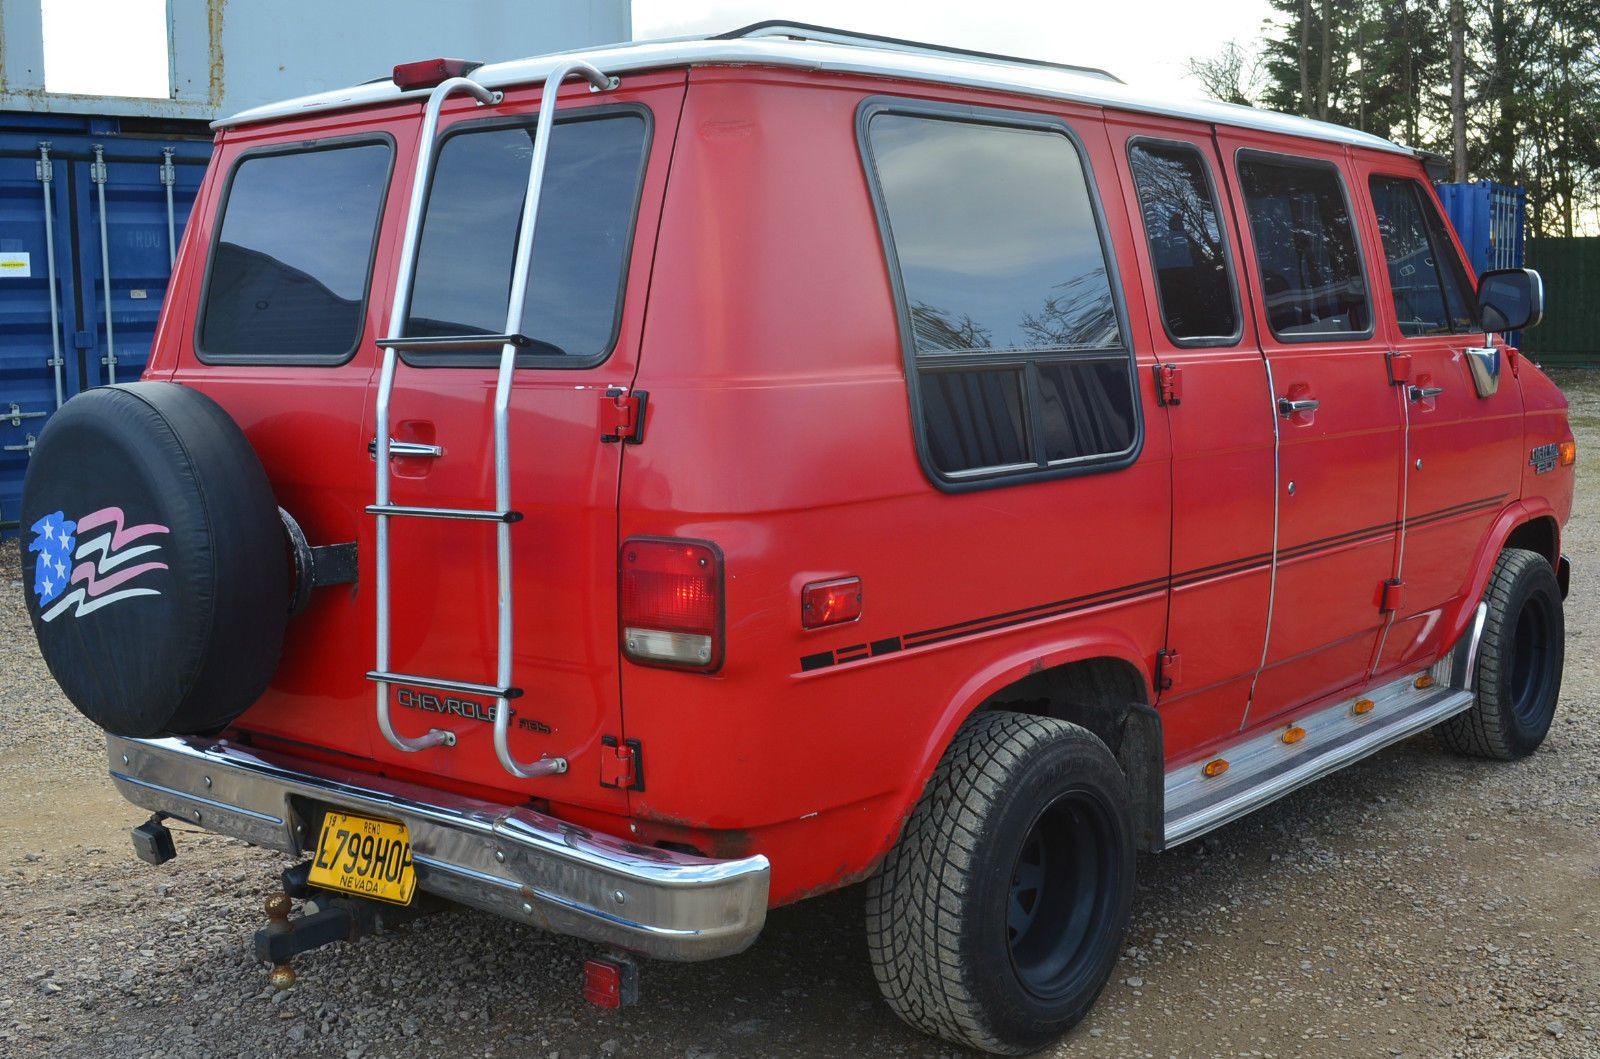 Chevrolet Chevy G20 Swb Rare In Uk Day Van Just Look Lovely Van